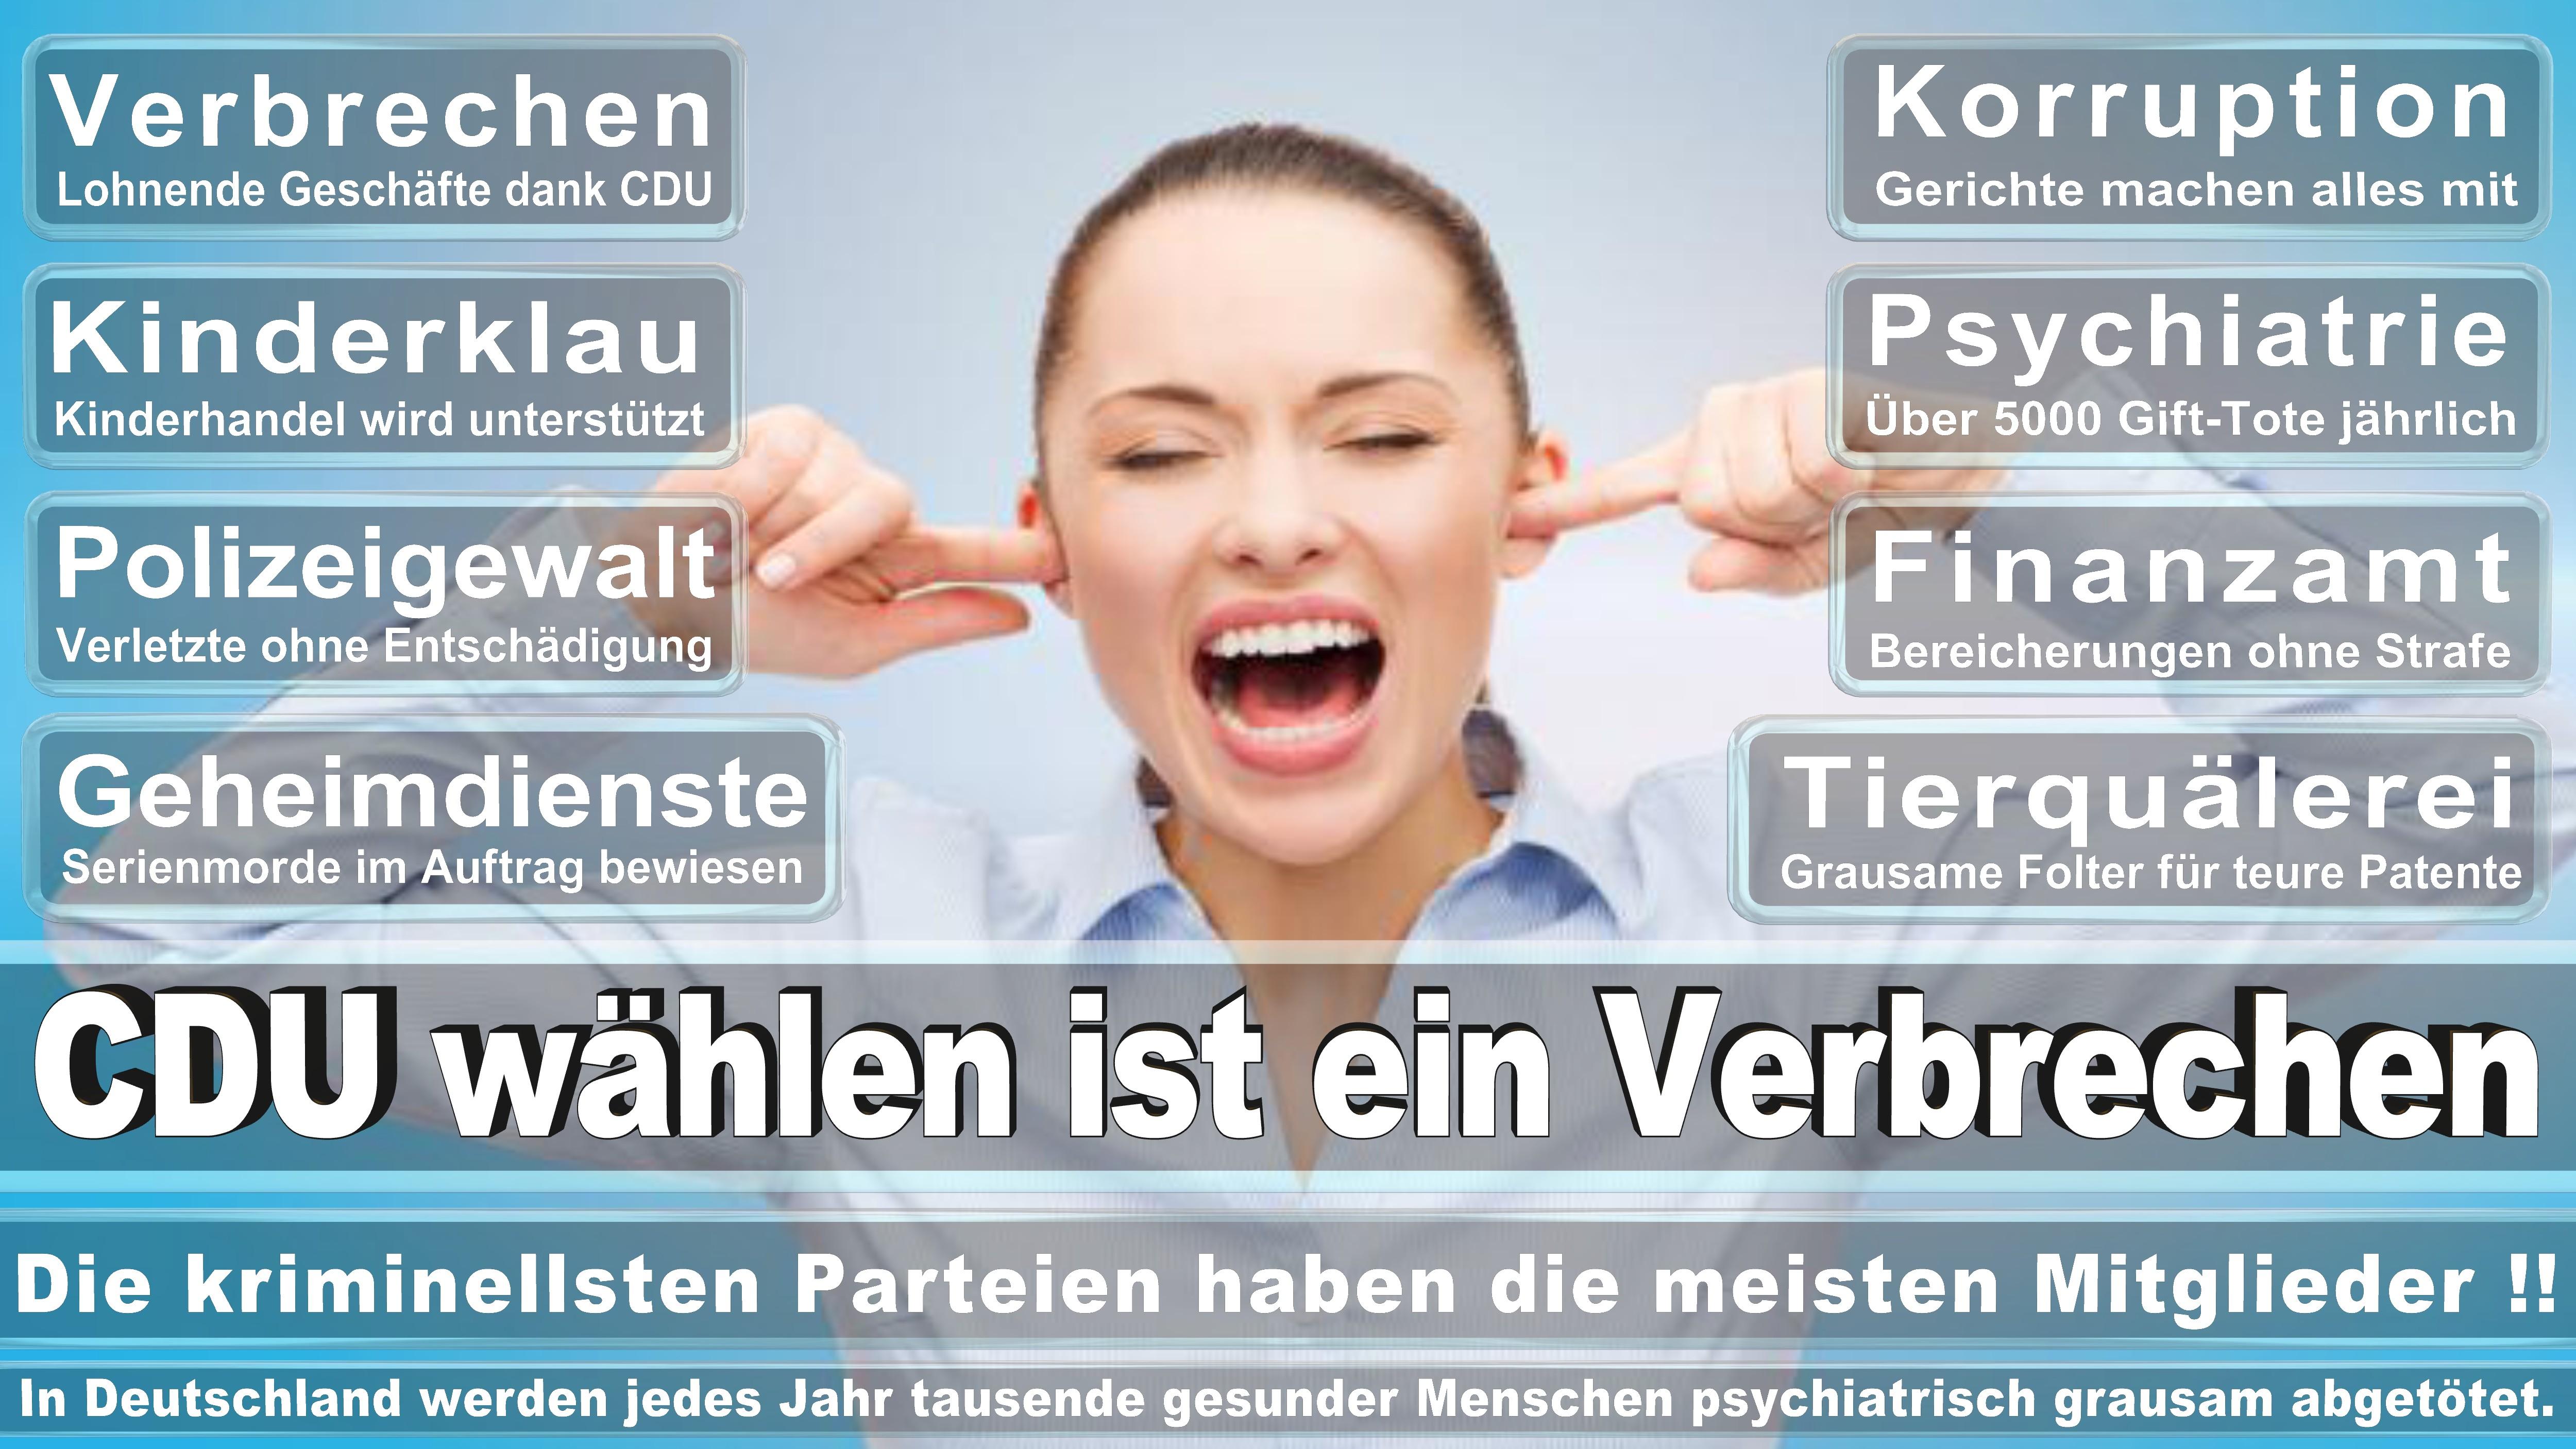 Herbert Behrens DIE LINKE Niedersachsen Politiker Deutschland